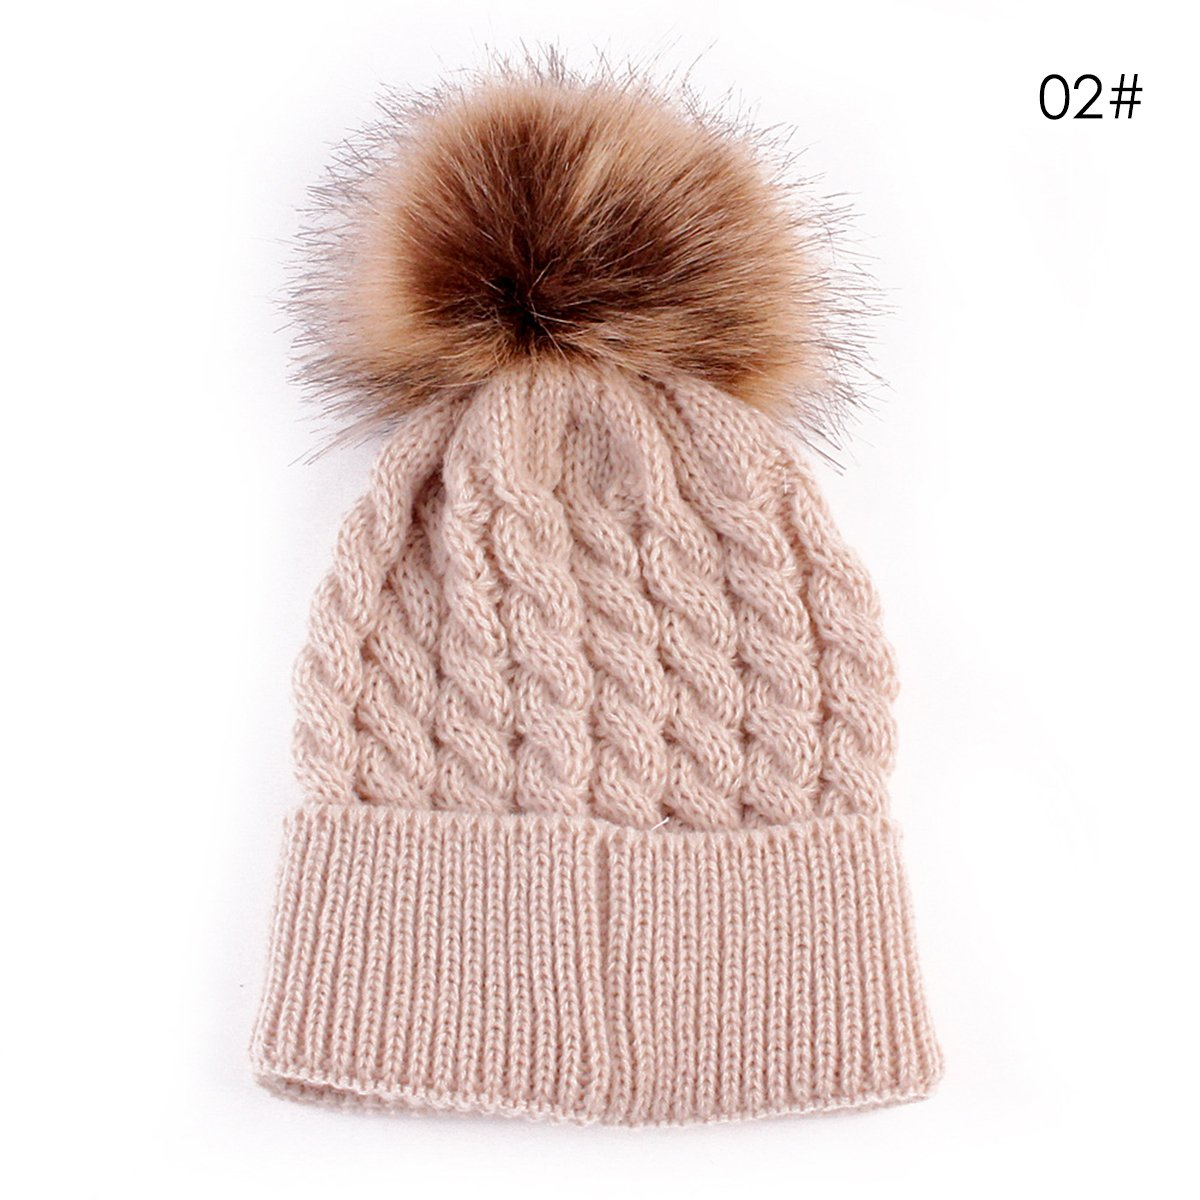 Infant Winter Warm Knit Crochet Caps Baby Beanie Hat Toddler Kid ...